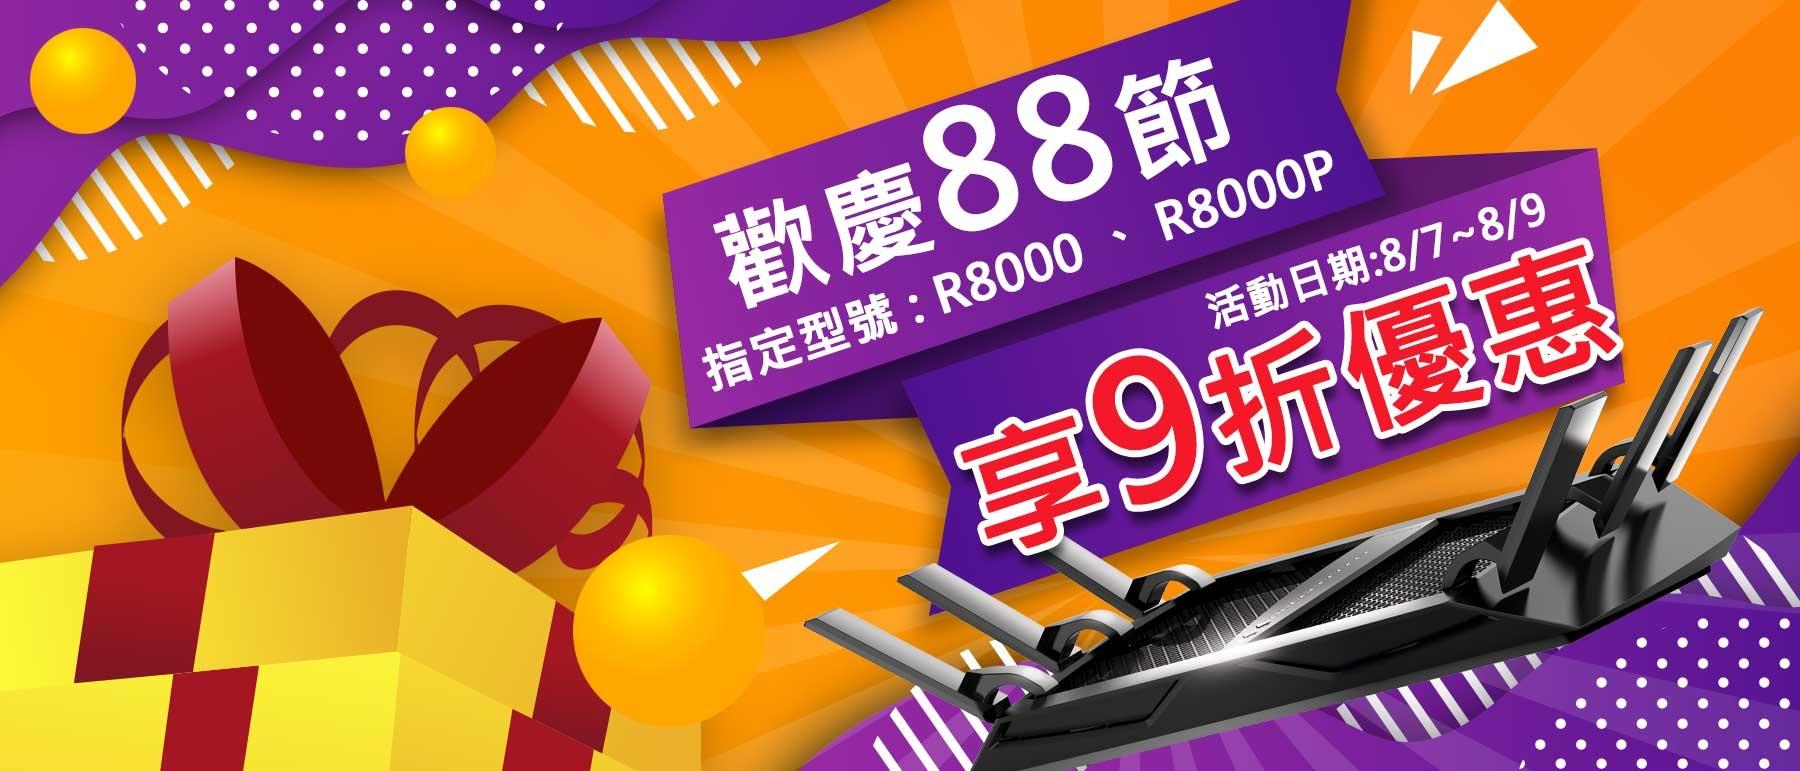 NETGEAR 台灣旗艦店 R8000 R8000p